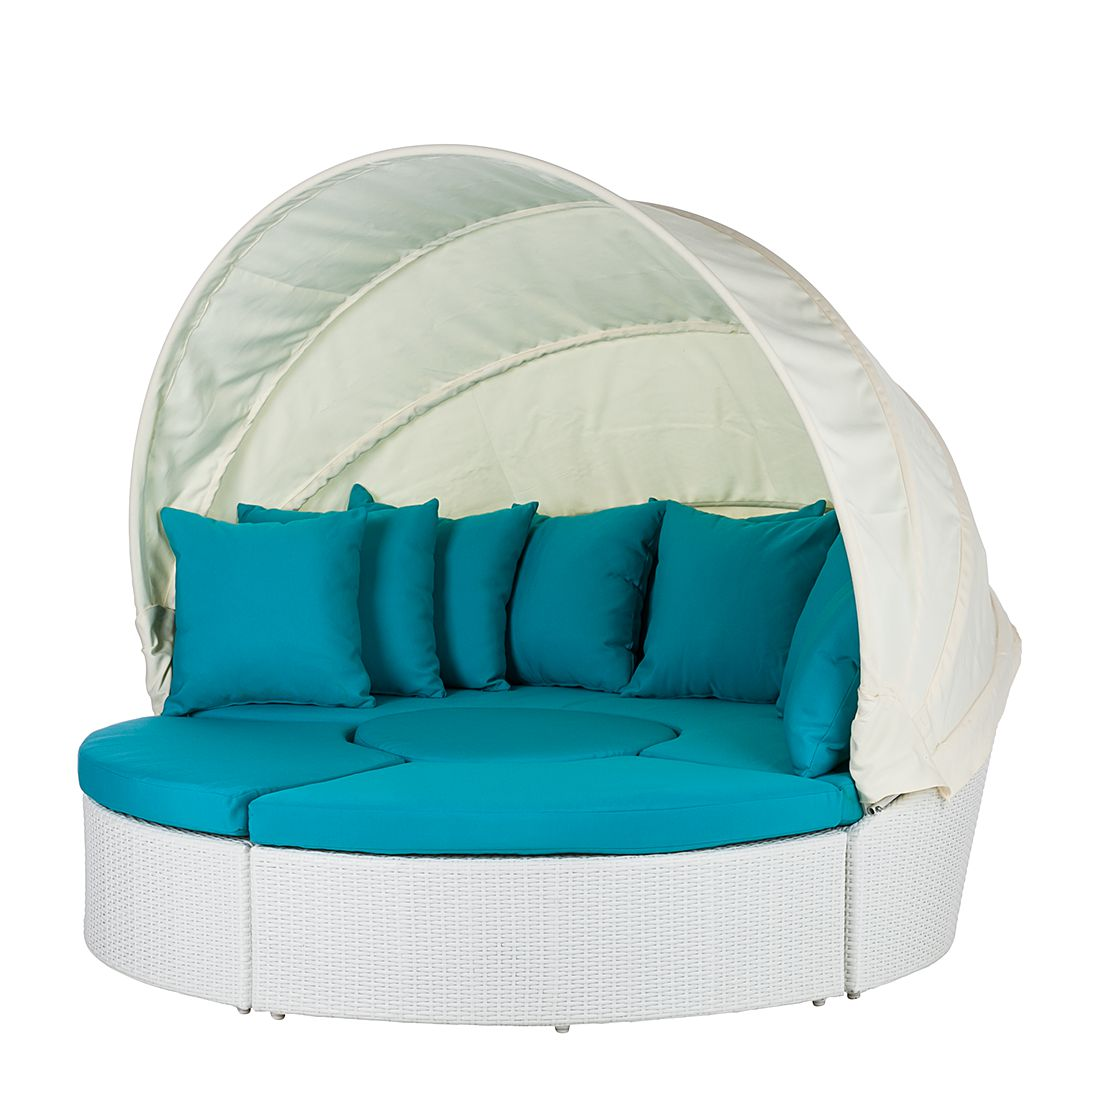 Sonneninsel White Comfort (4-teilig) - Polyrattan/Textil - Weiß/Türkis, Fredriks